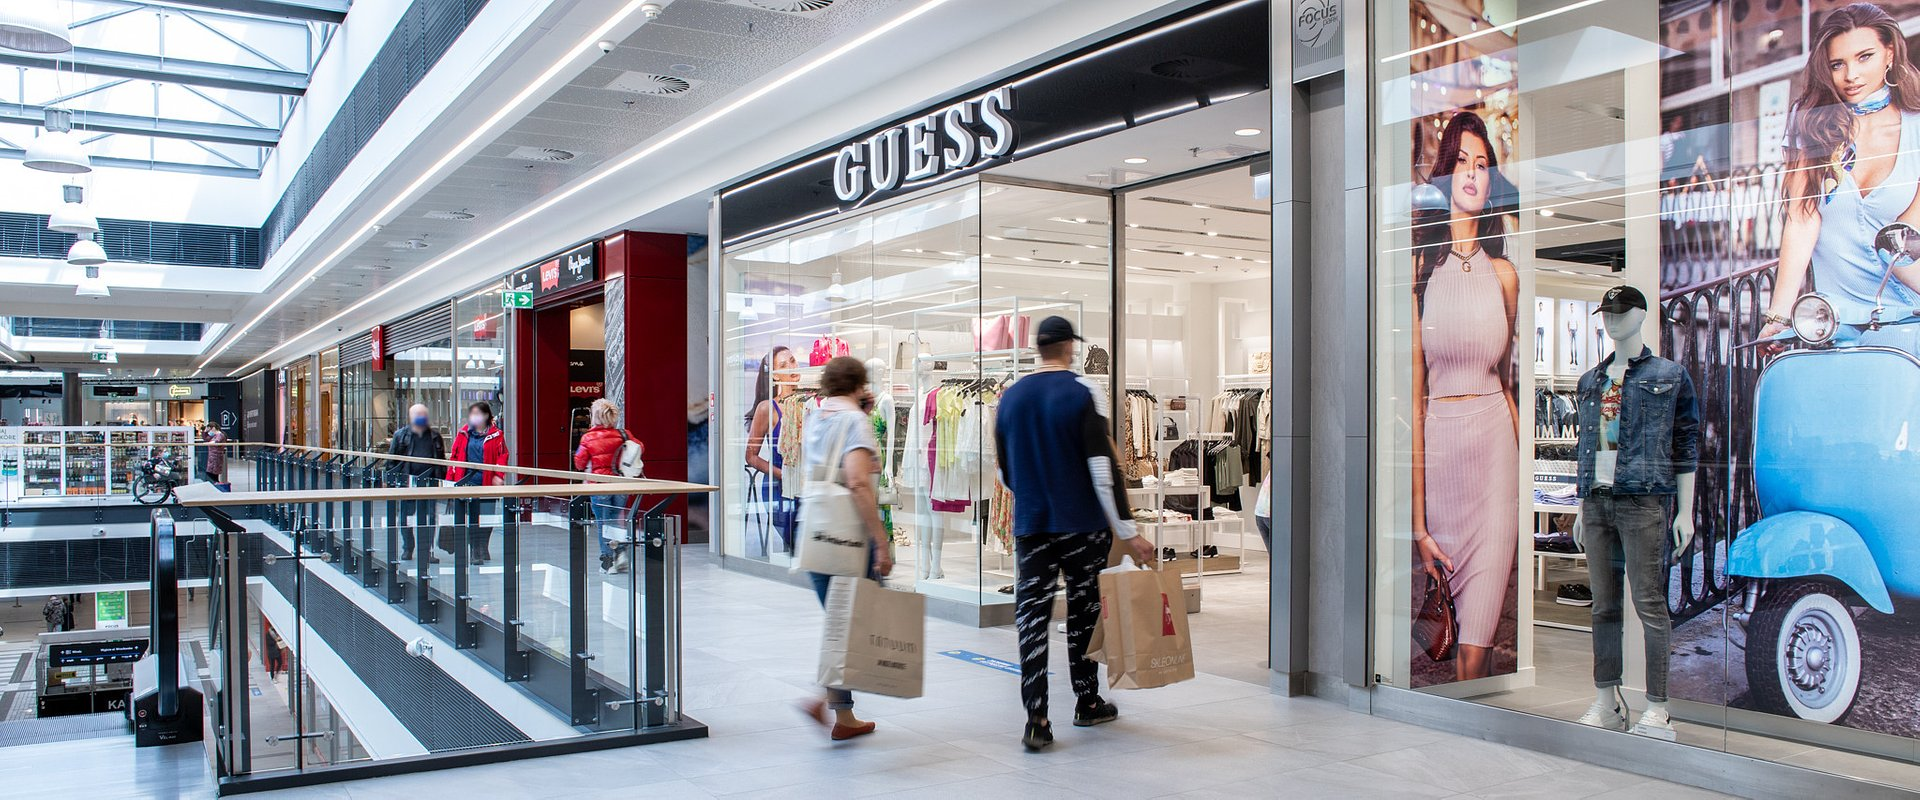 Salon Guess w Focus Mall